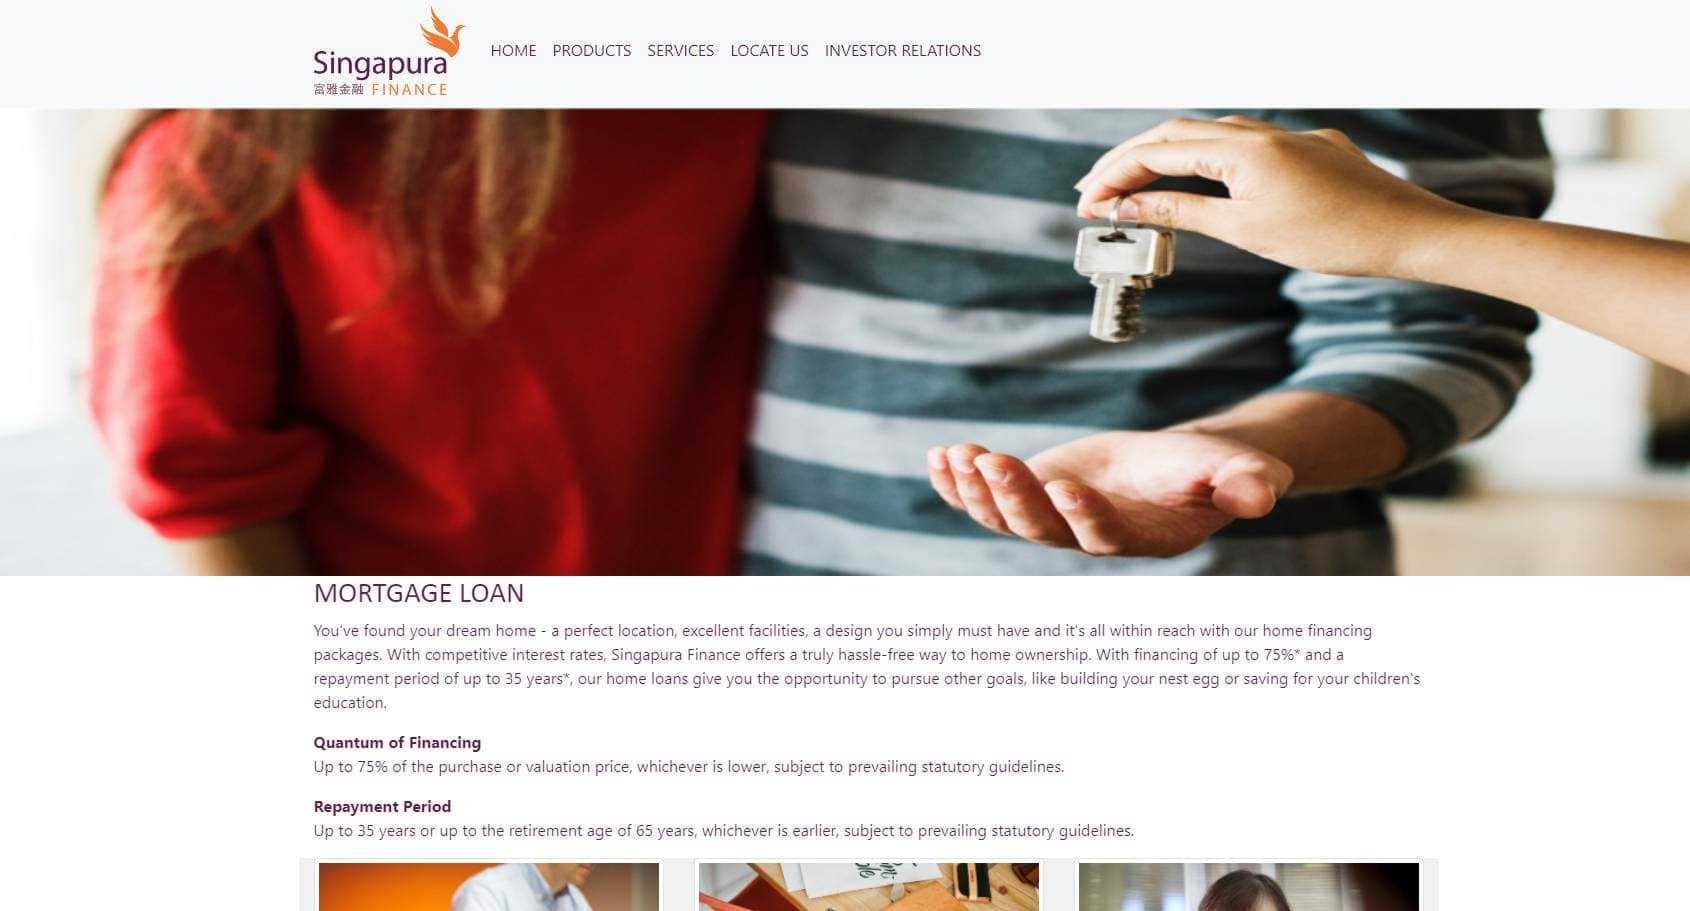 Singapura Finance Top Home Loan Providers in Singapore